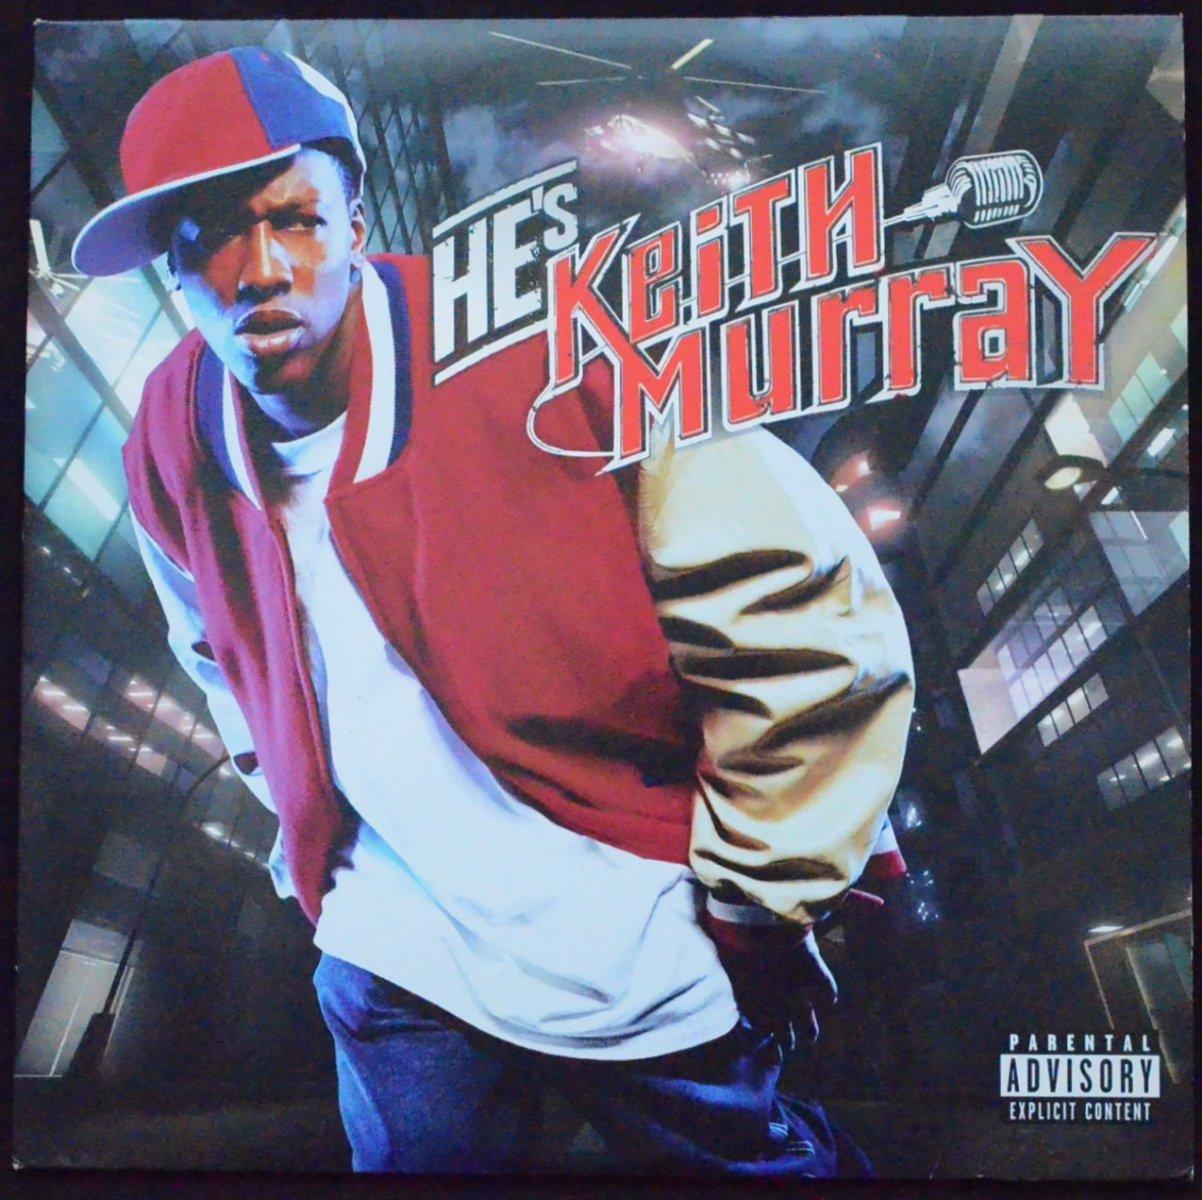 KEITH MURRAY / HE'S KEITH MURRAY (2LP)